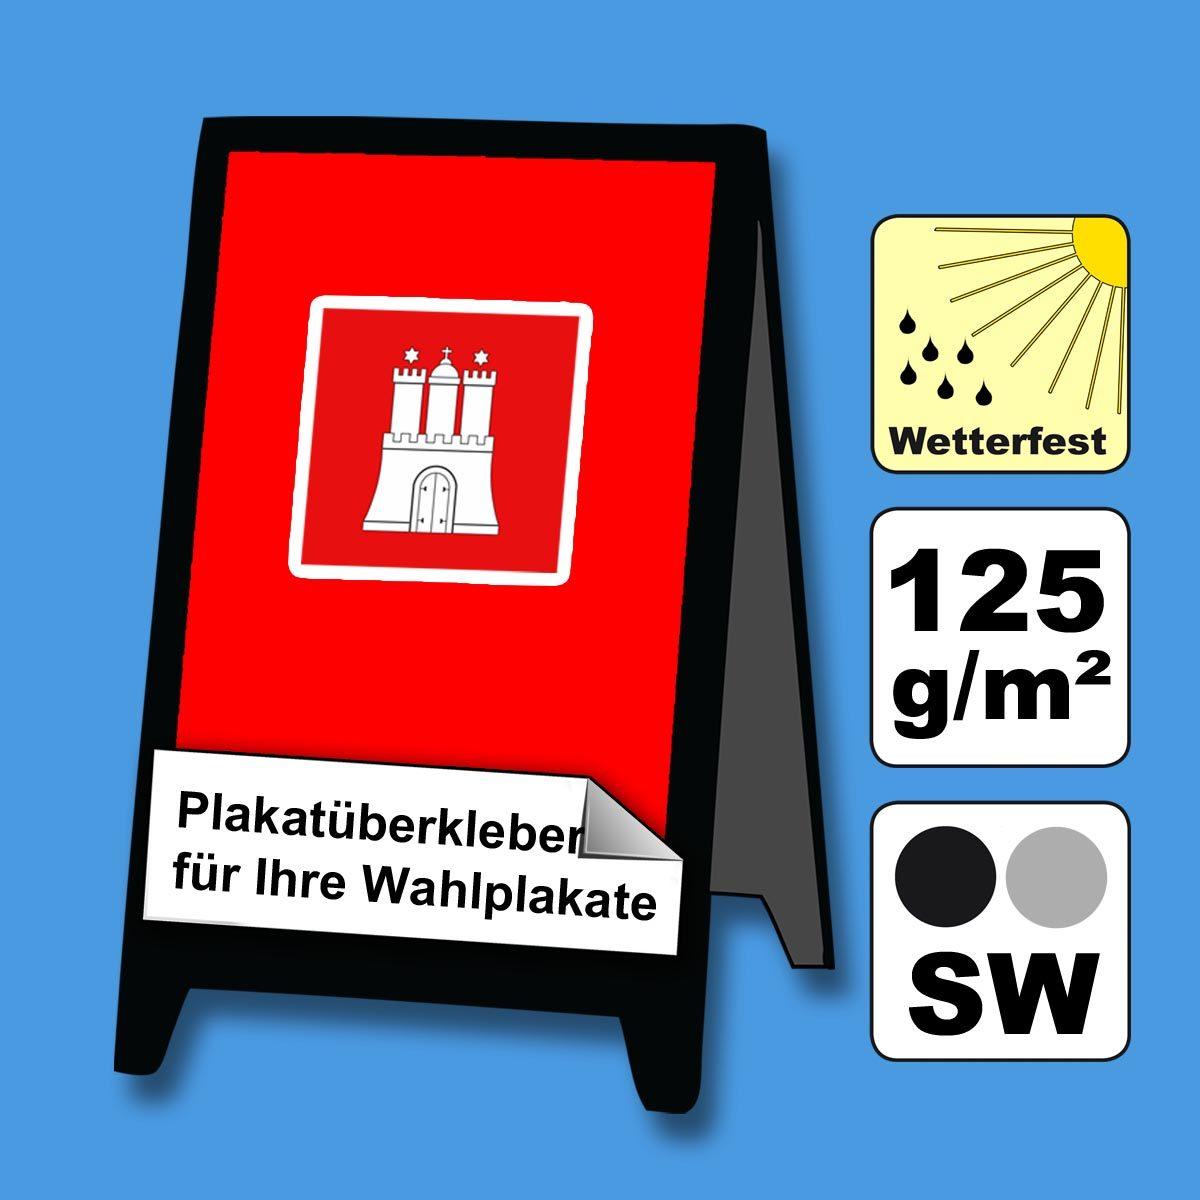 Firmen_LFP_Plakate_SW_Ueberkleber